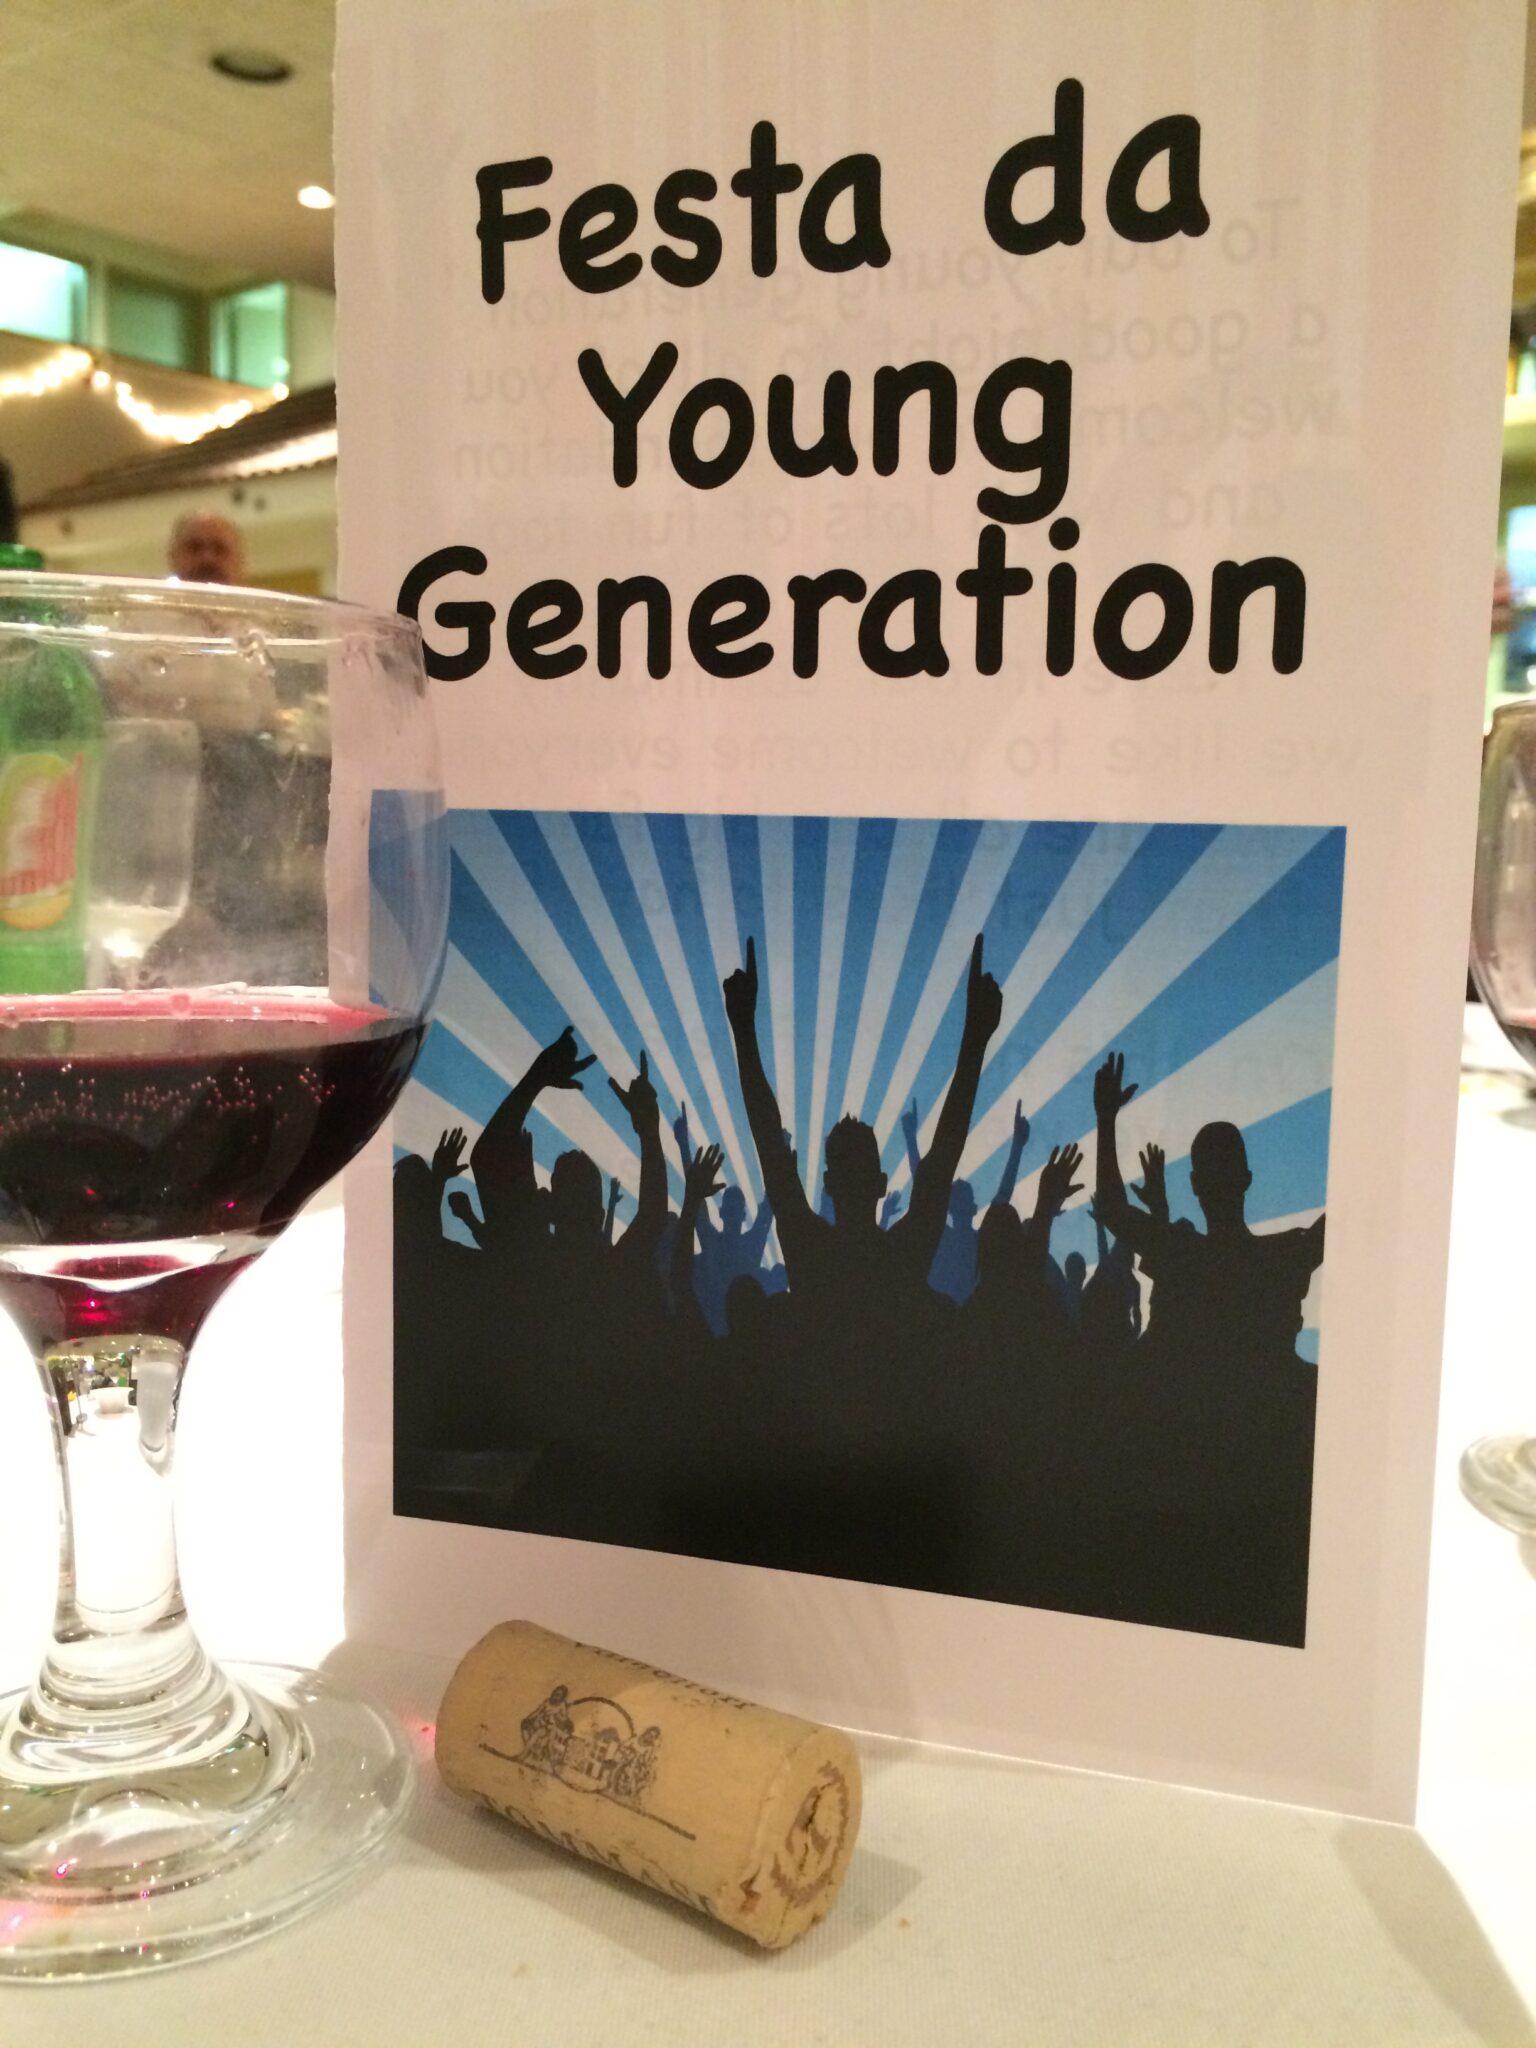 Festa da Young Generation